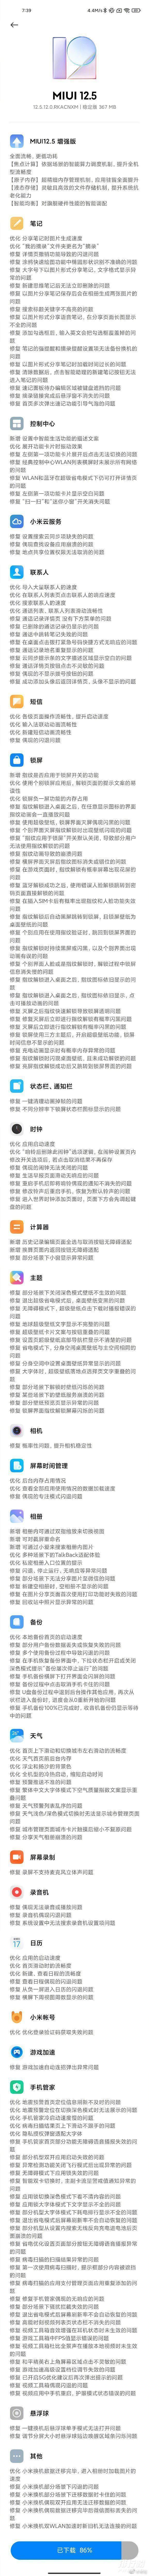 MIUI12.5.12稳定版怎么样_MIUI12.5.12稳定版更新内容